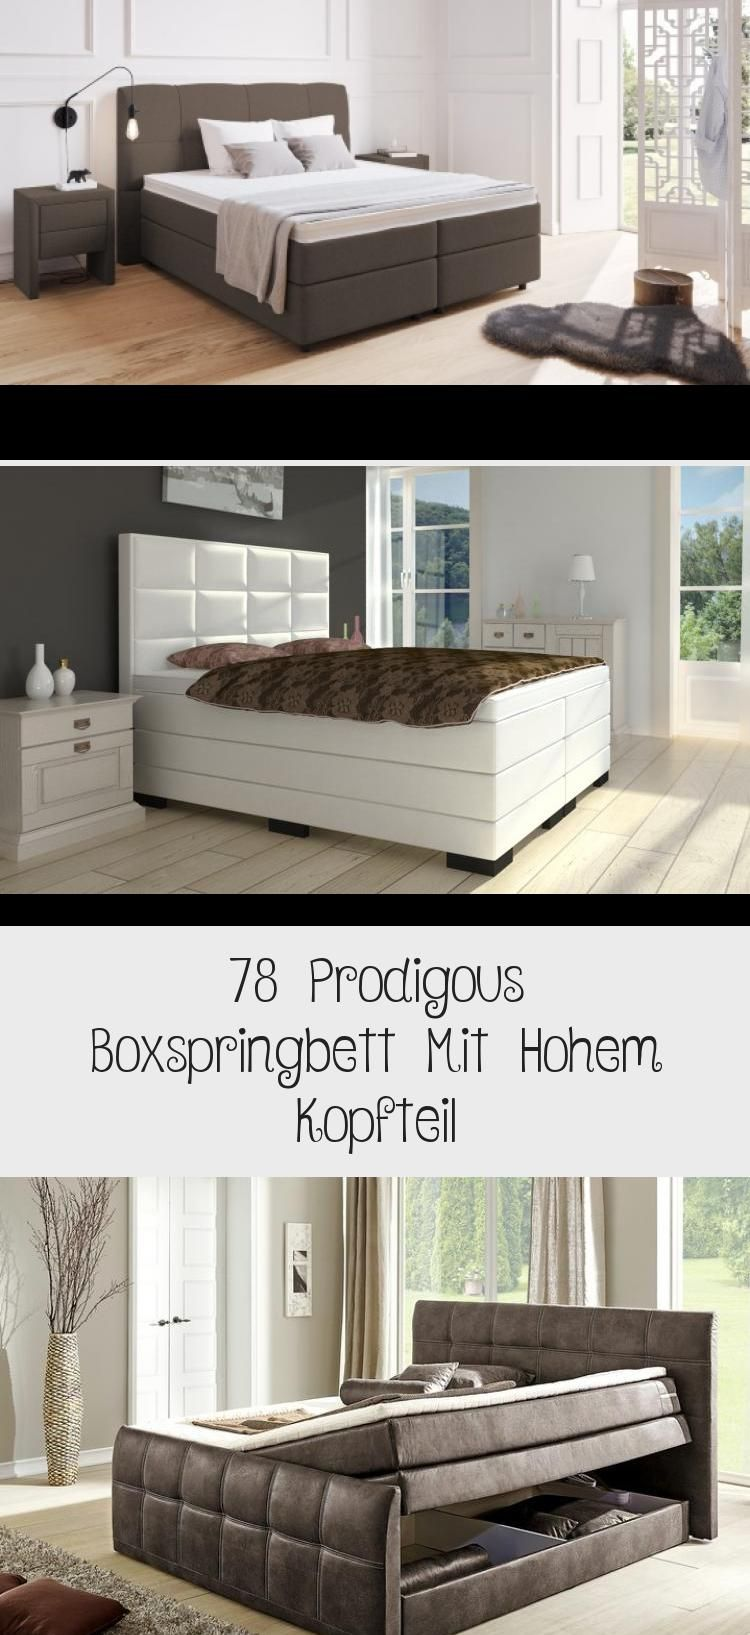 78 Prodigous Boxspringbett Mit Hohem Kopfteil With Images Home Decor Home Decor